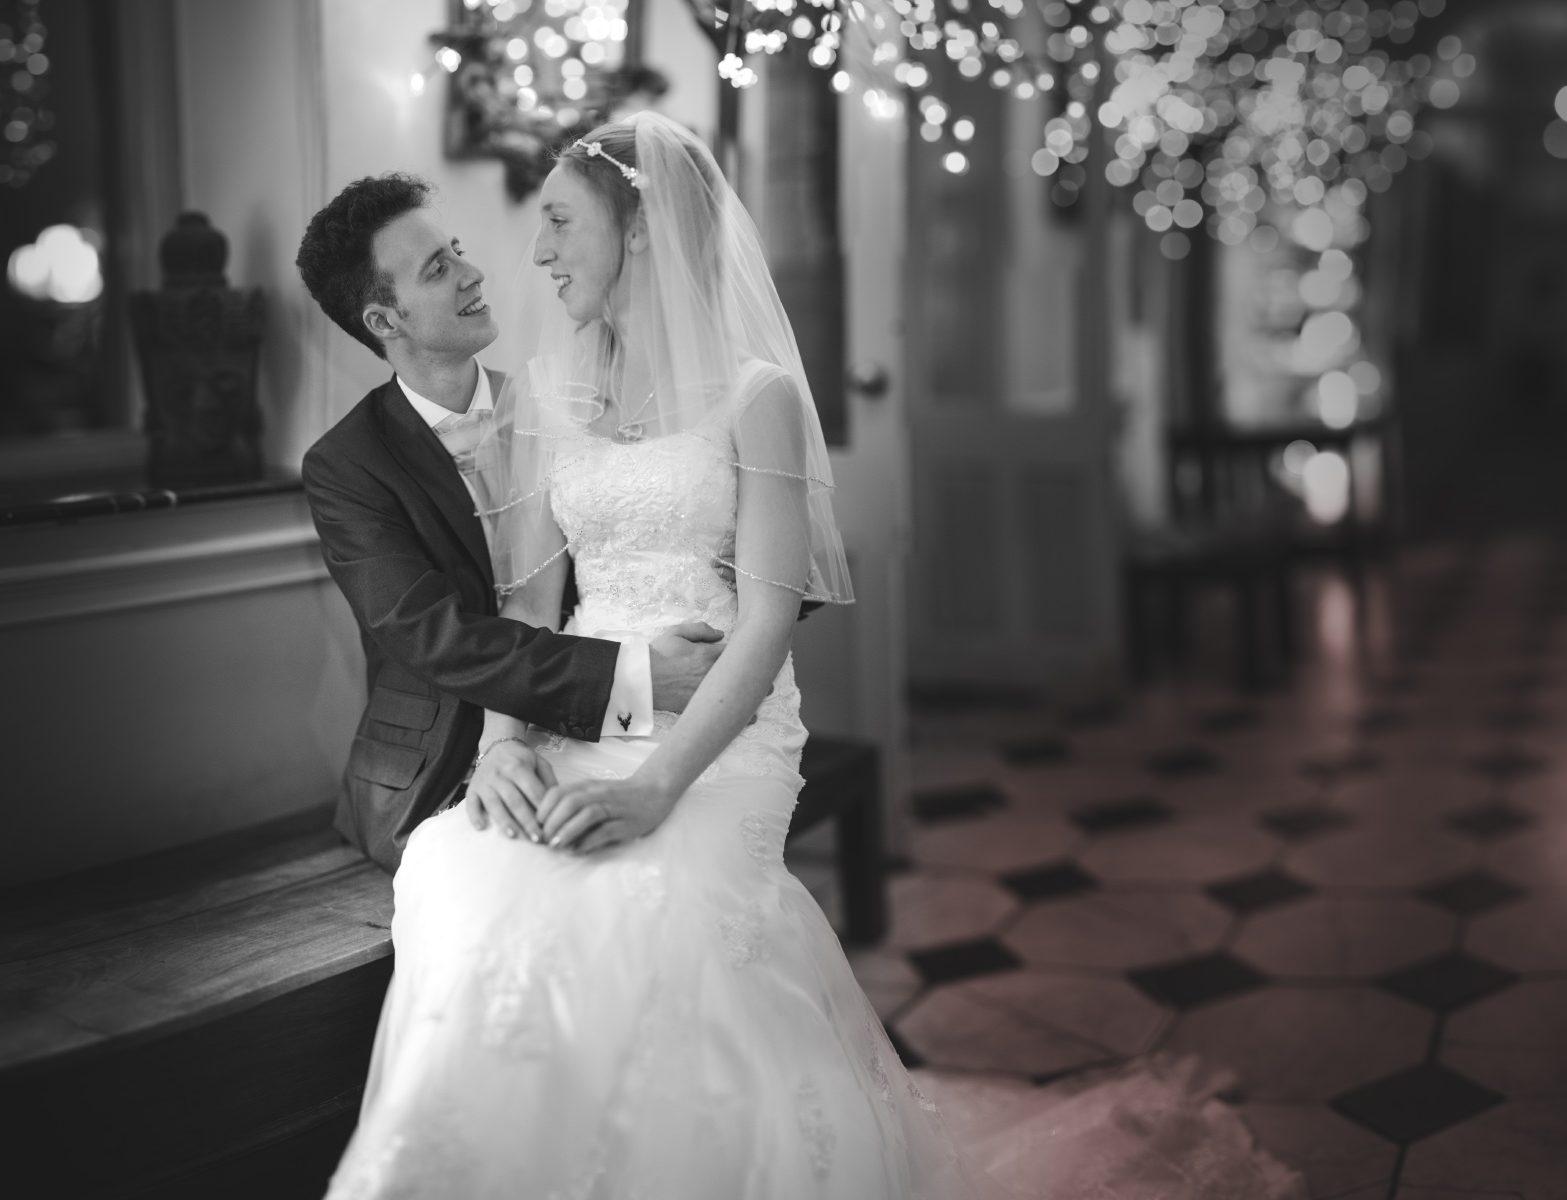 Charlotte & Richard - South Devon Wedding Photography Langdon Court